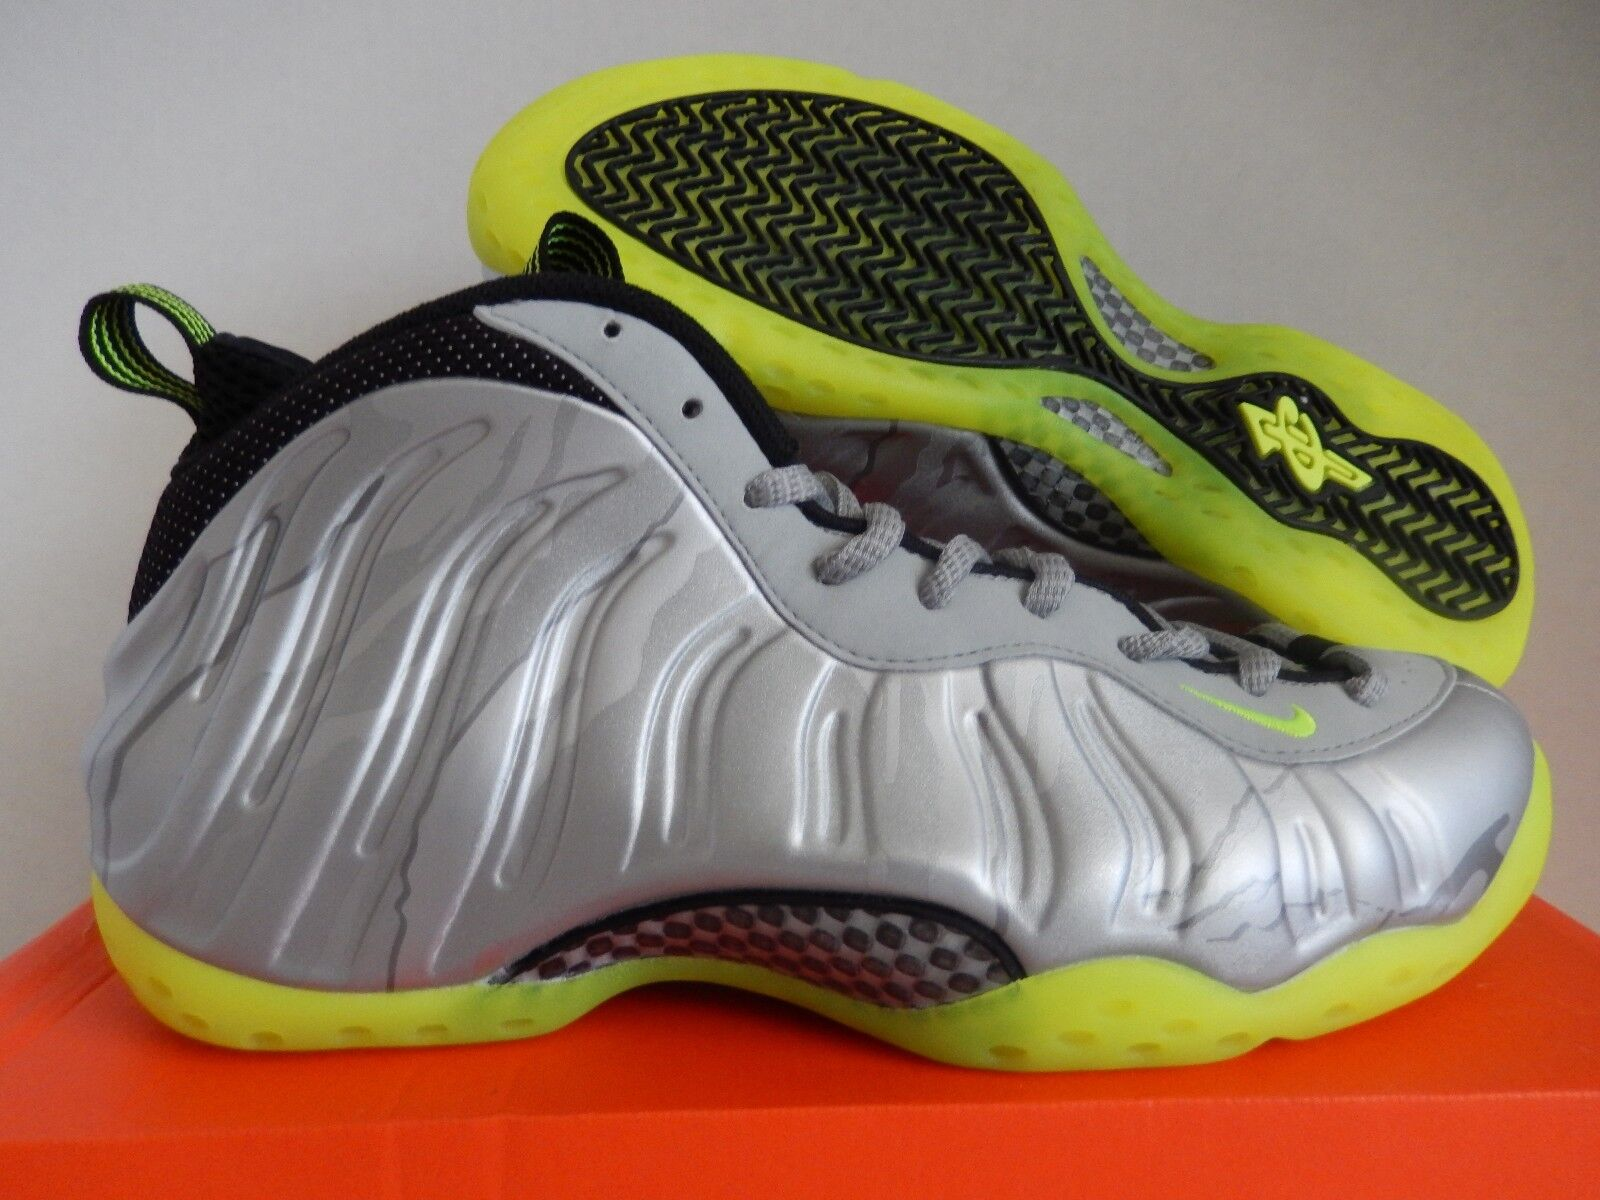 best sneakers 1119e a5350 ... pro en venta 1a6e8 2187a  50% off nike air foamposite foamposite  foamposite one plata volt negro 575420 004 541fc2 19990